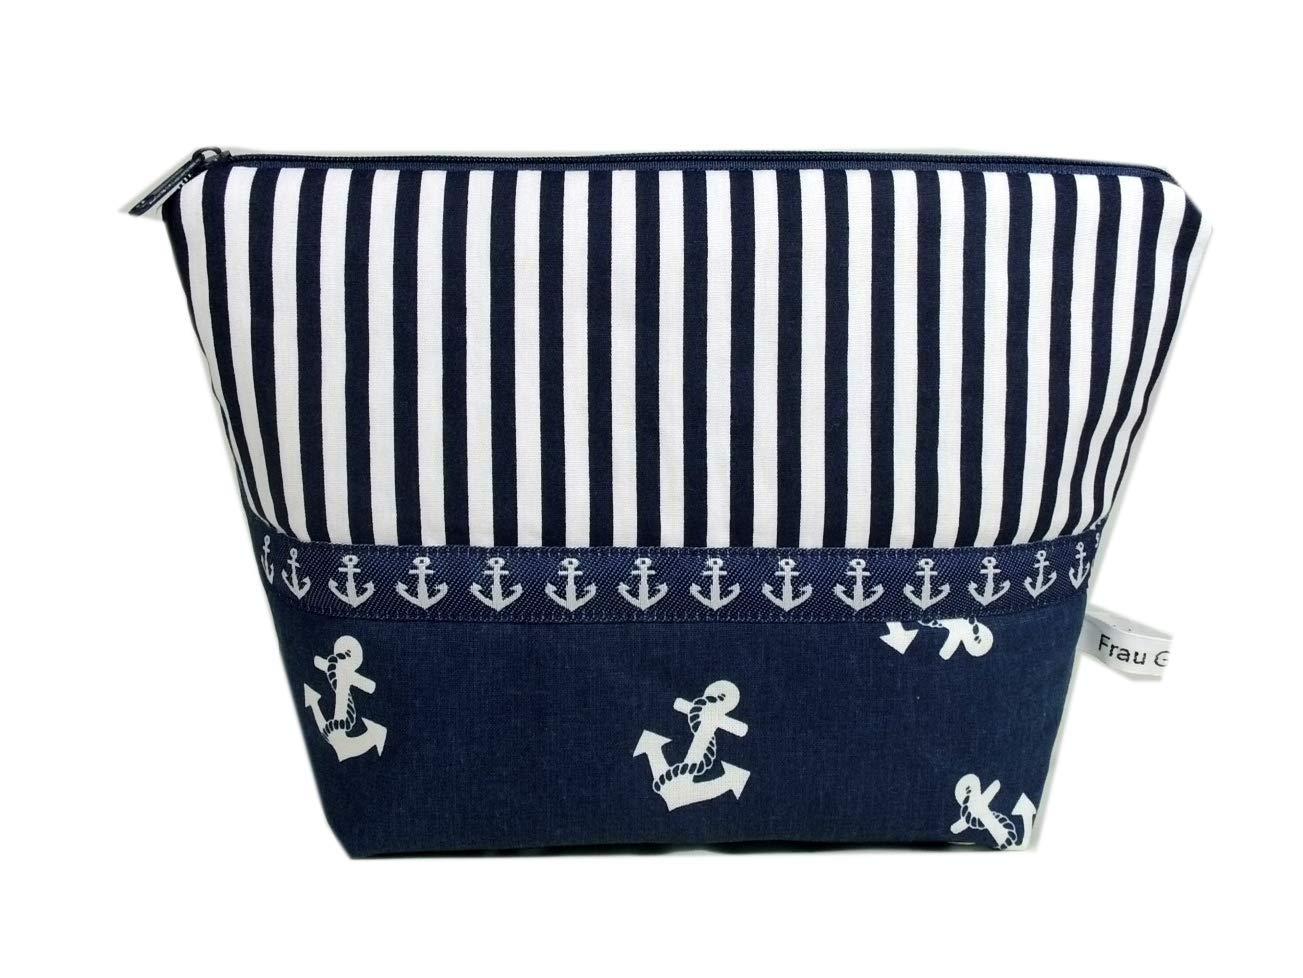 Kosmetiktasche blau Anker maritim wei/ß gestreift Meer Streifen handmade